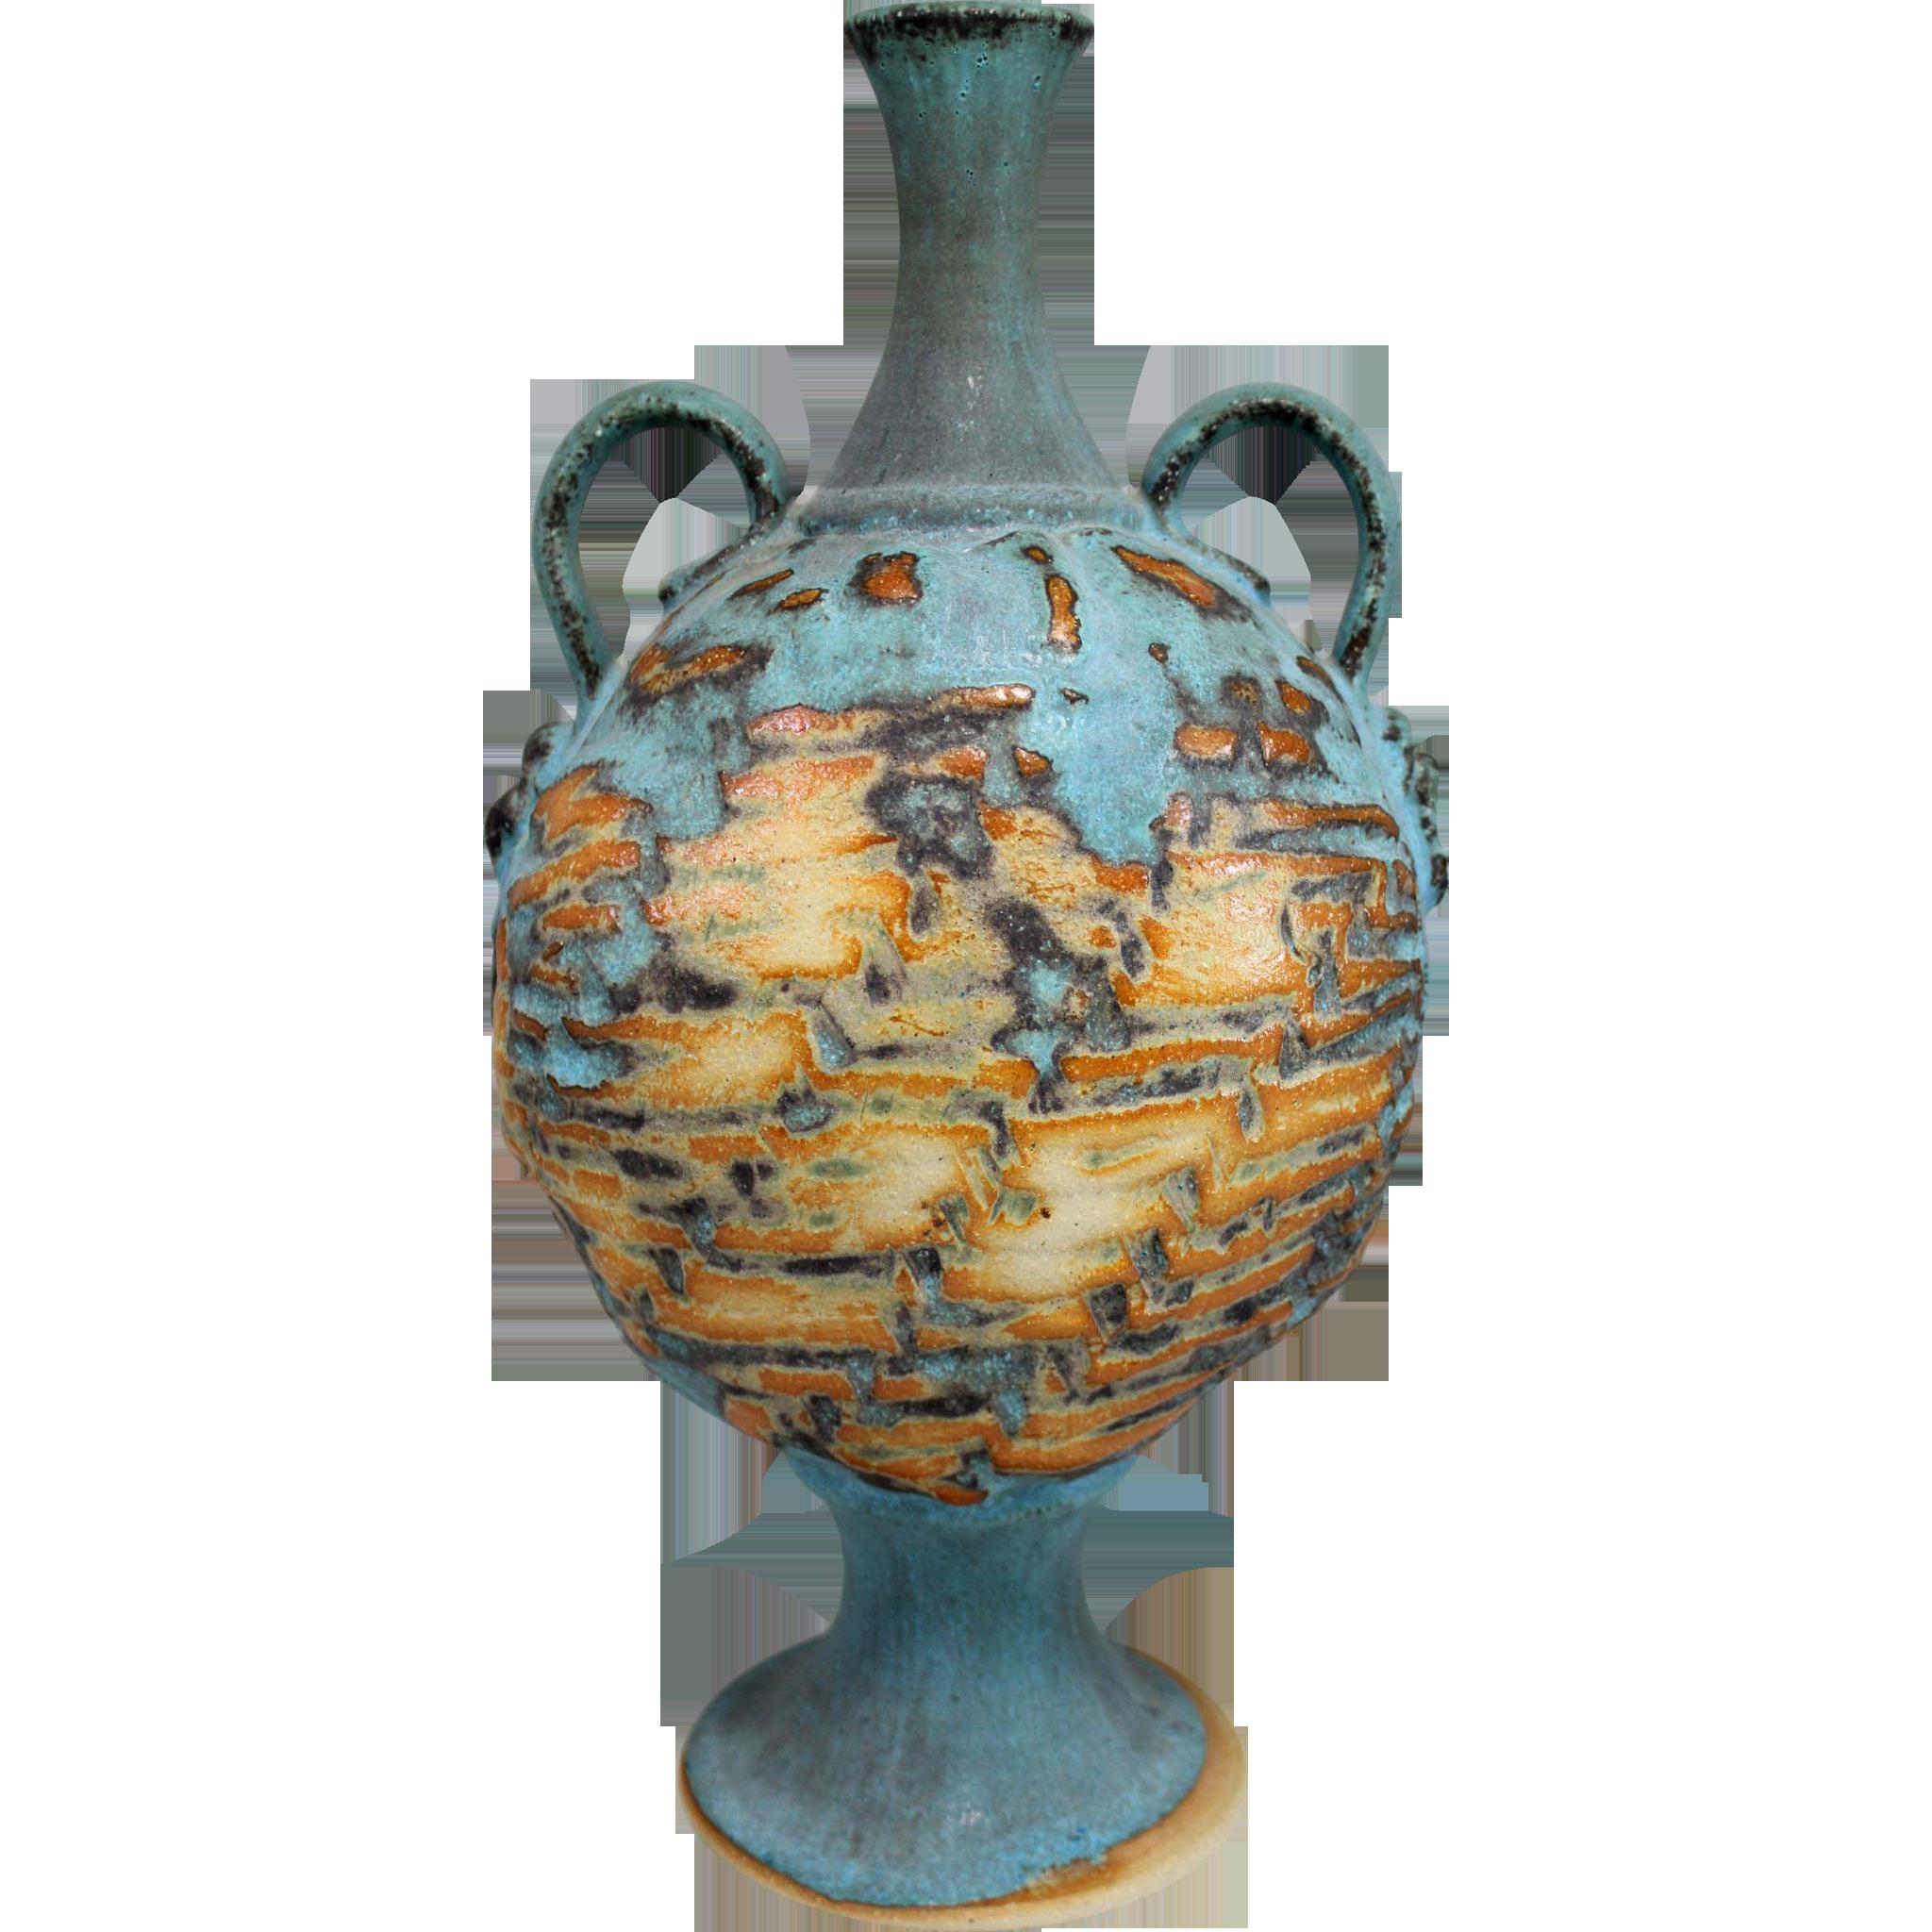 Polychrome Classic Form Art Pottery Handled Vase